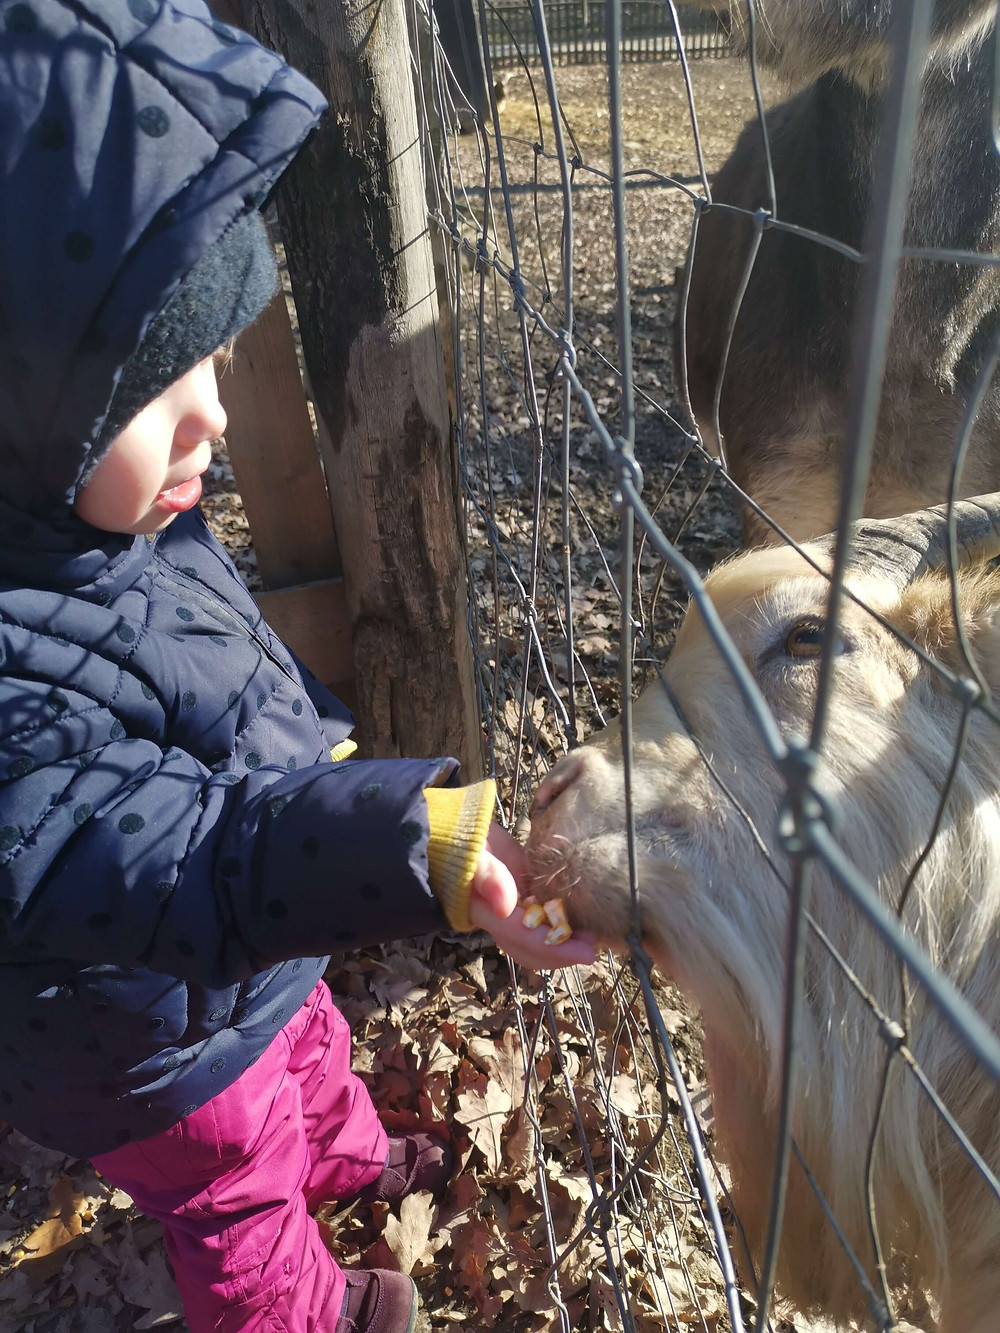 Katharina rührt, neue Kurse, Tierpark Ernstbrunn, Wildpark Ernstbrunn, Wegweiser neues Jahr